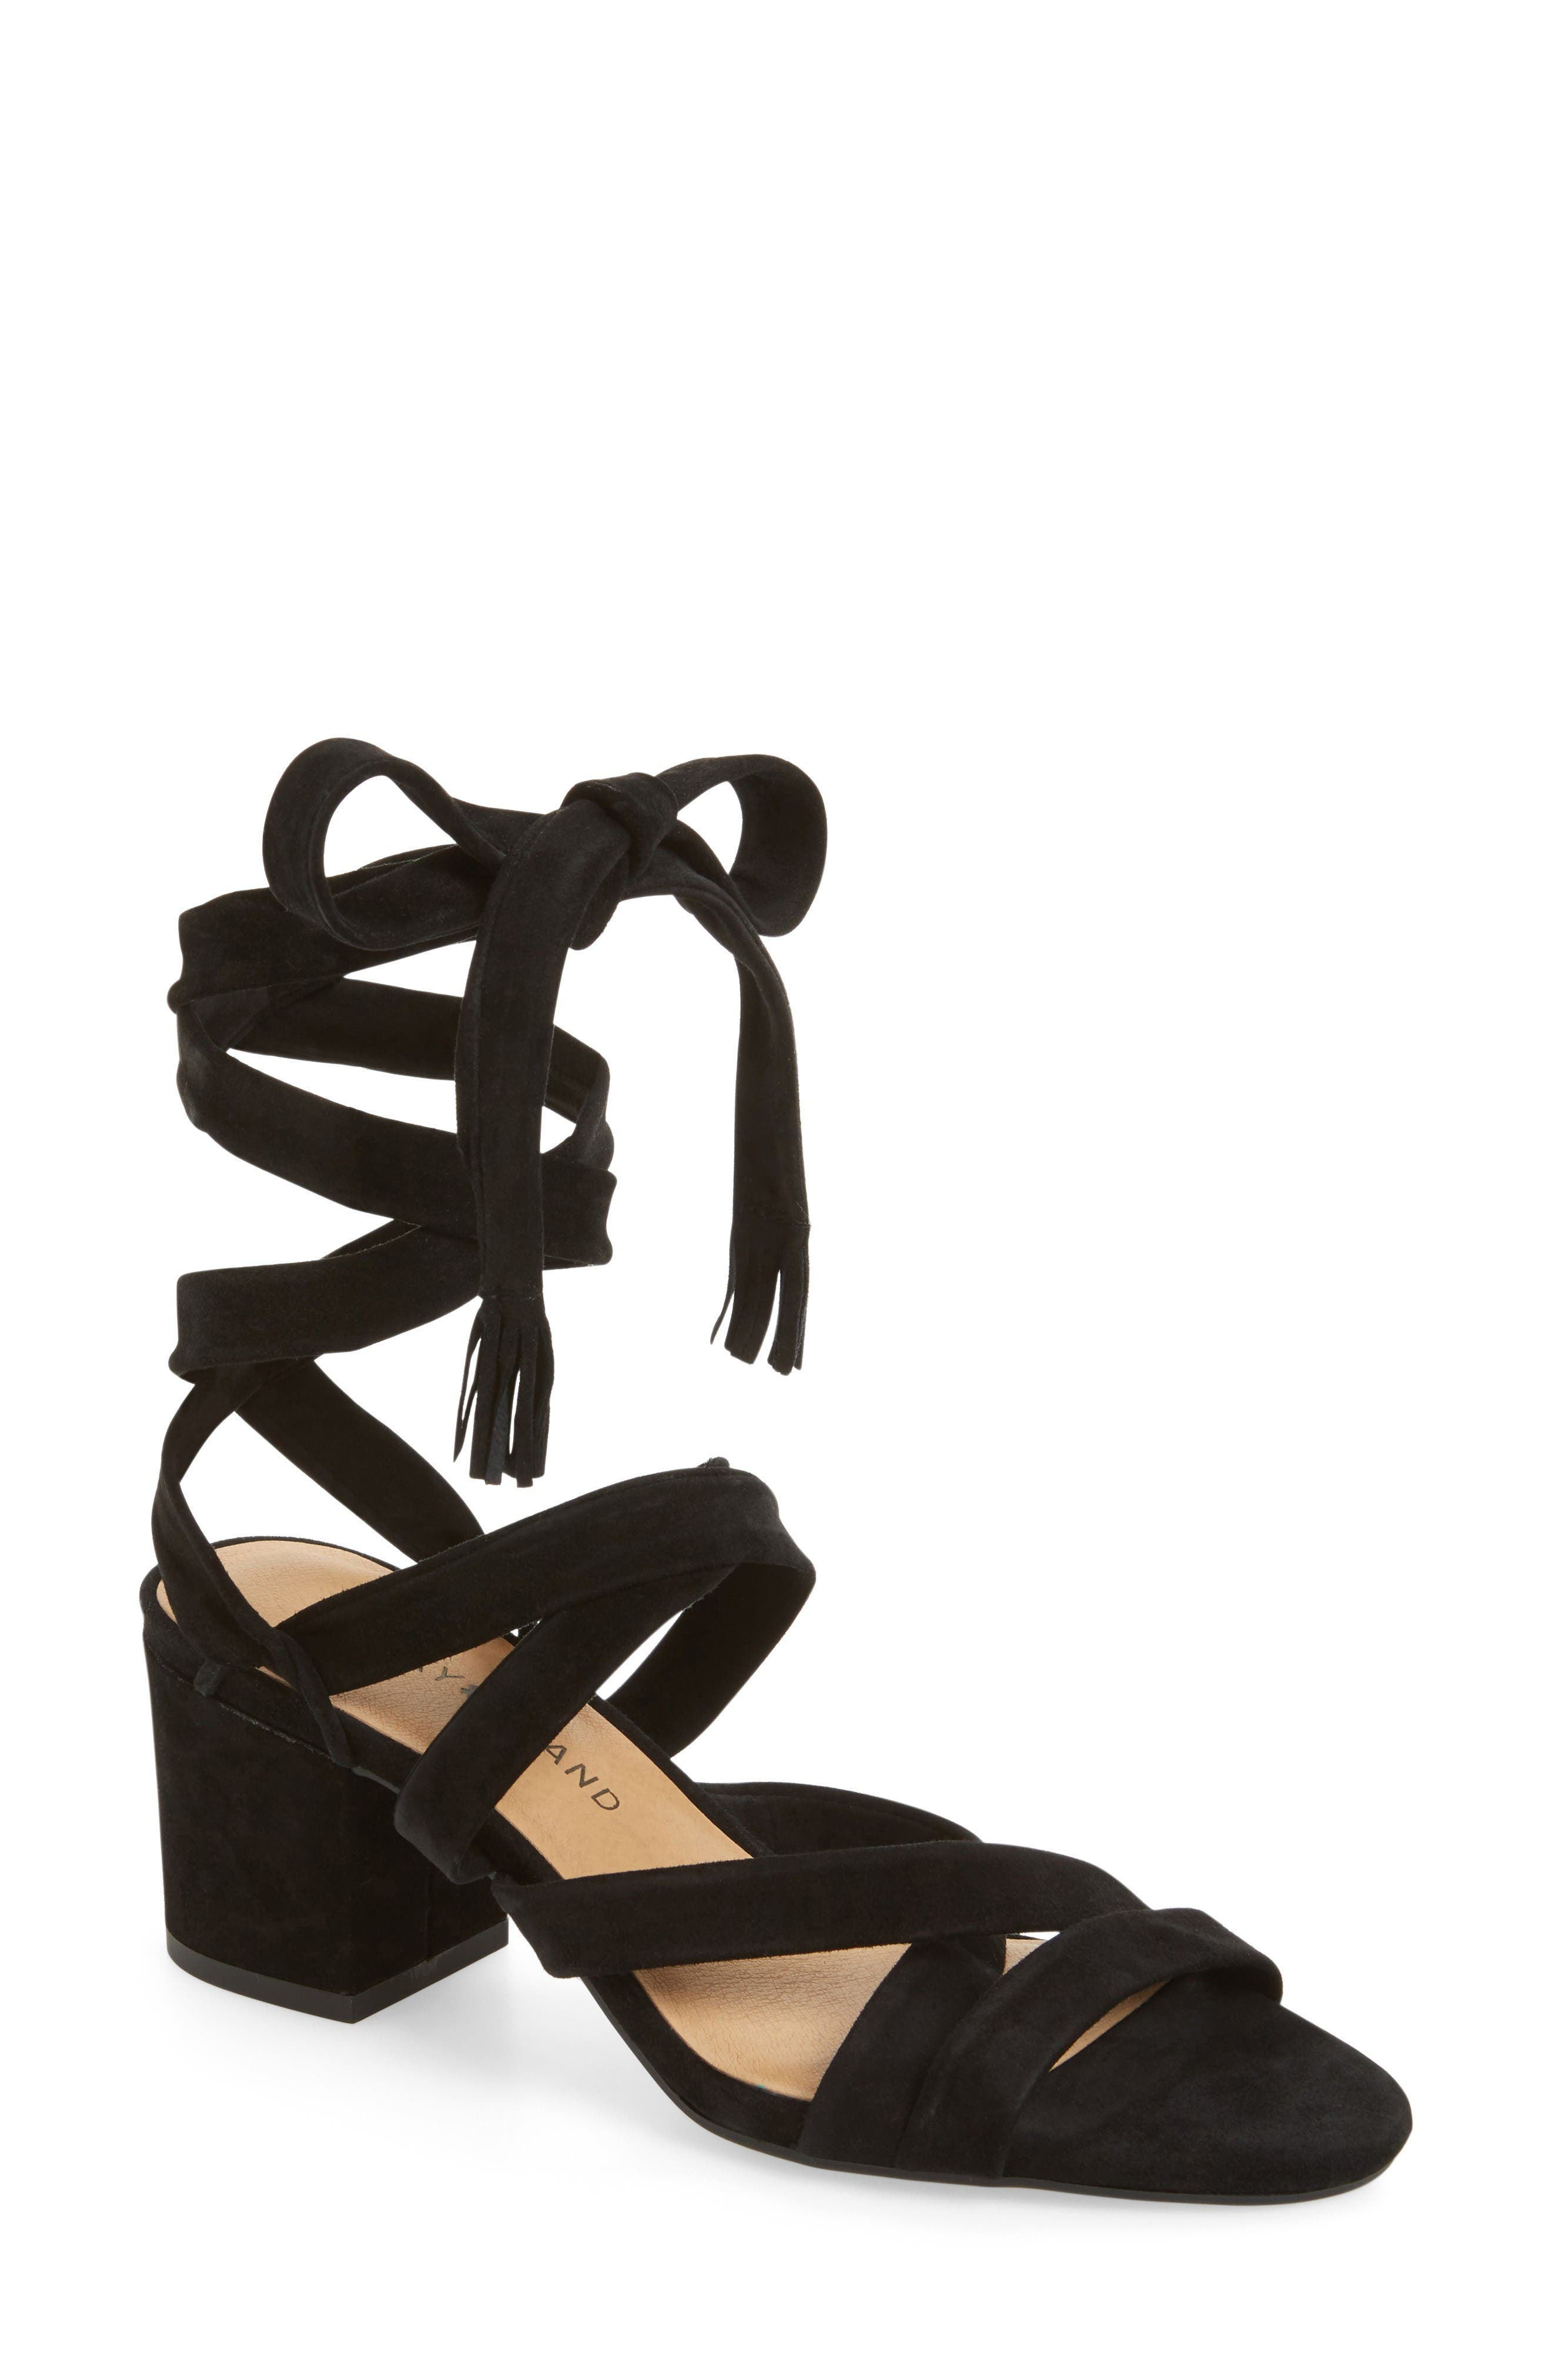 Alternate Image 1 Selected - Lucky Brand Idalina Block Heel Sandal (Women)